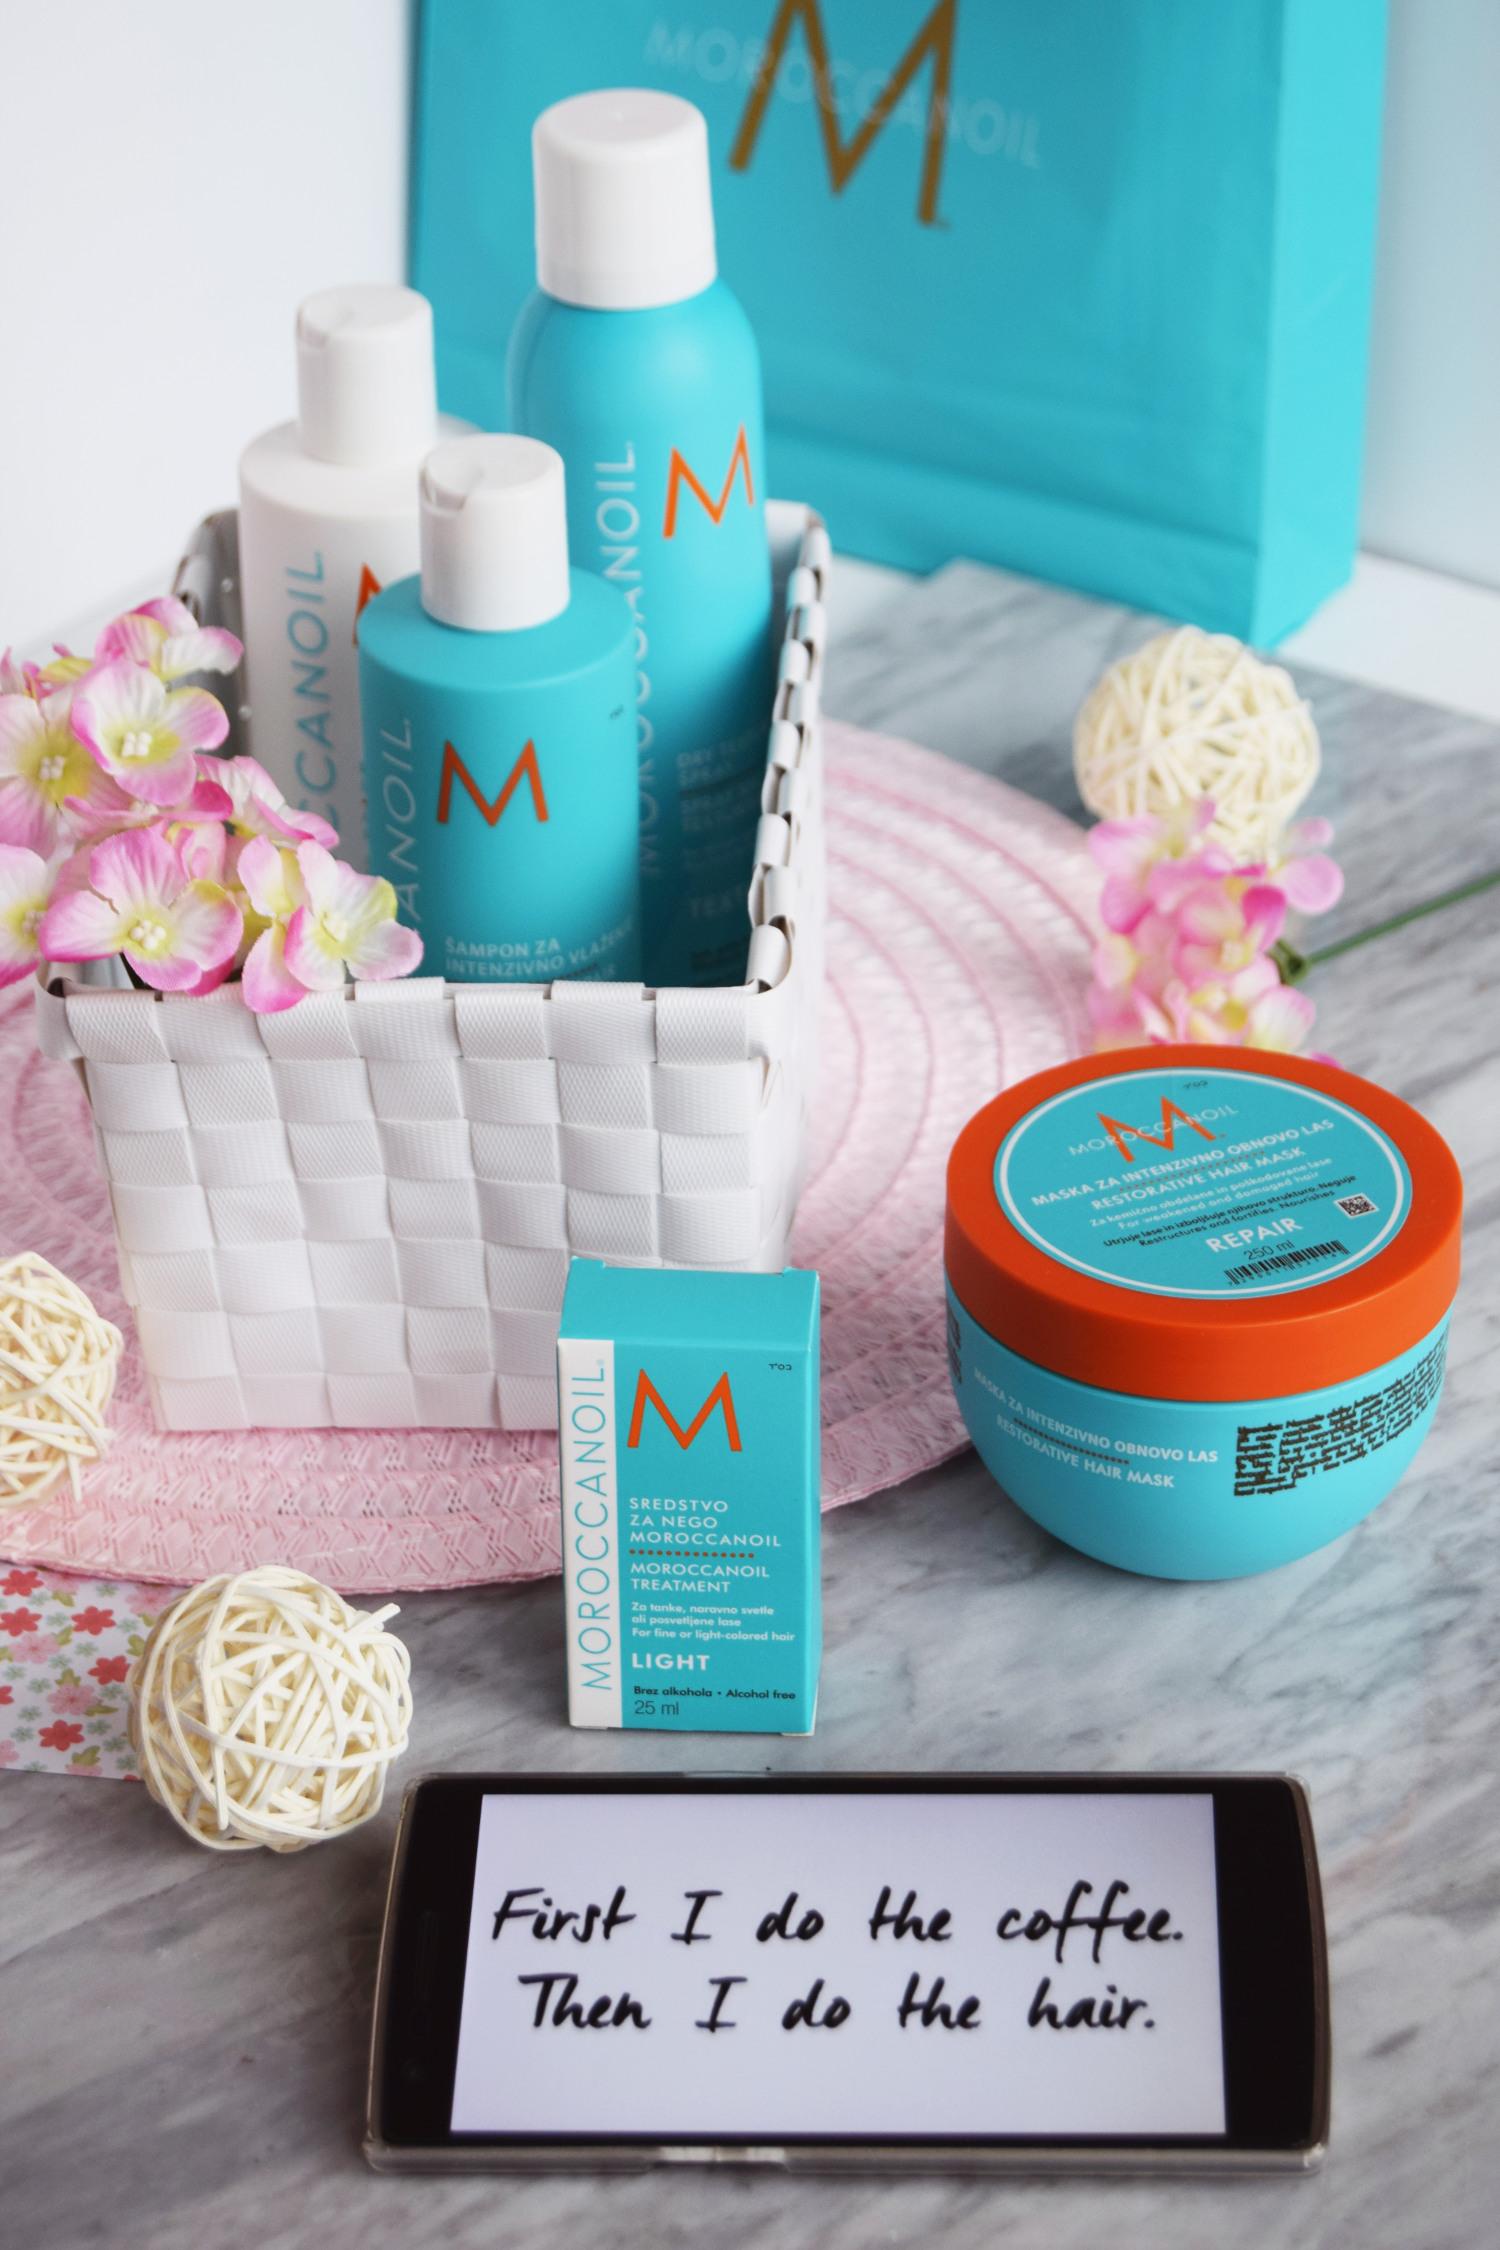 Moroccanoil_hair_Conditioner_Shampoo_Zalabell_beauty_5